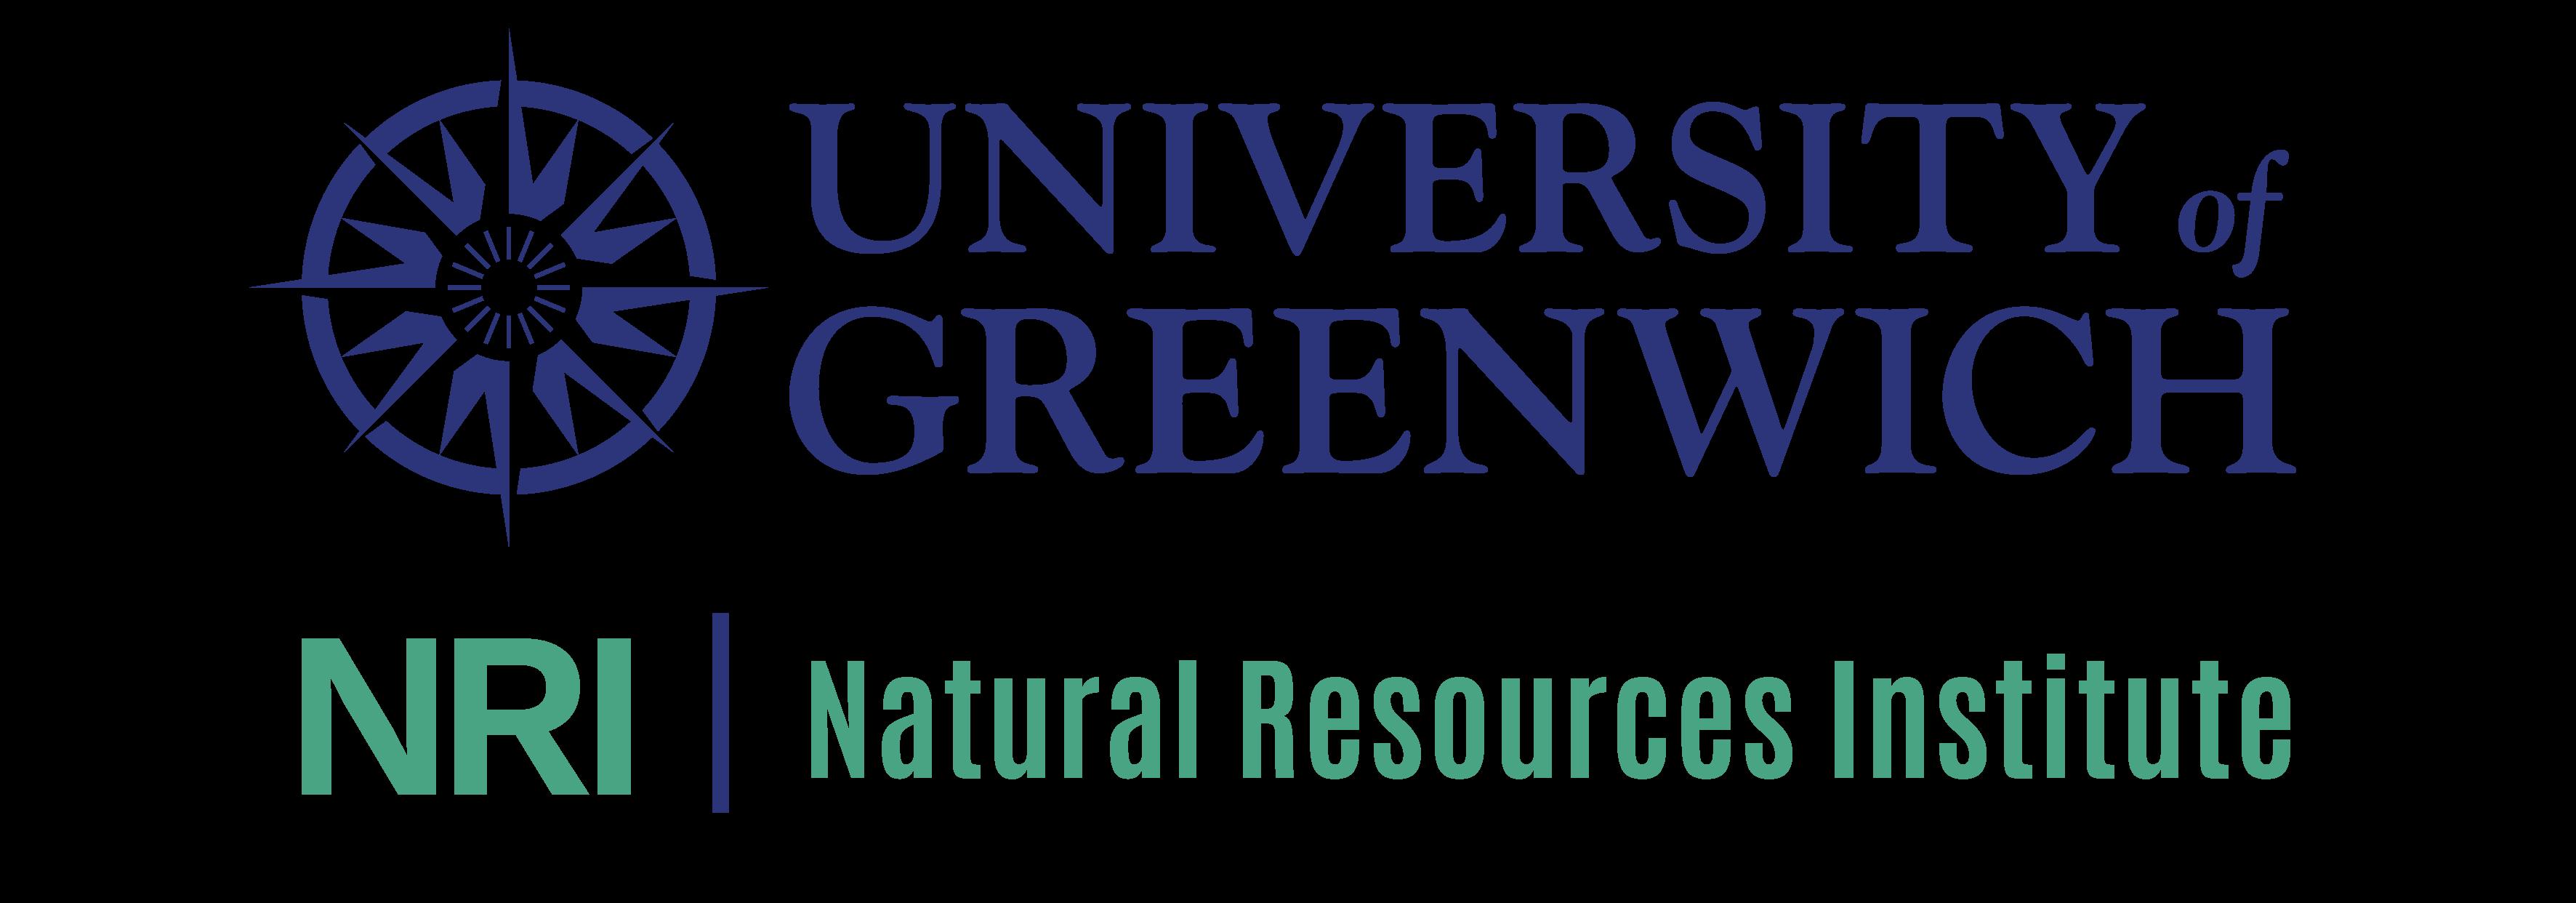 UoG_NRI 2020_4-01 (002)